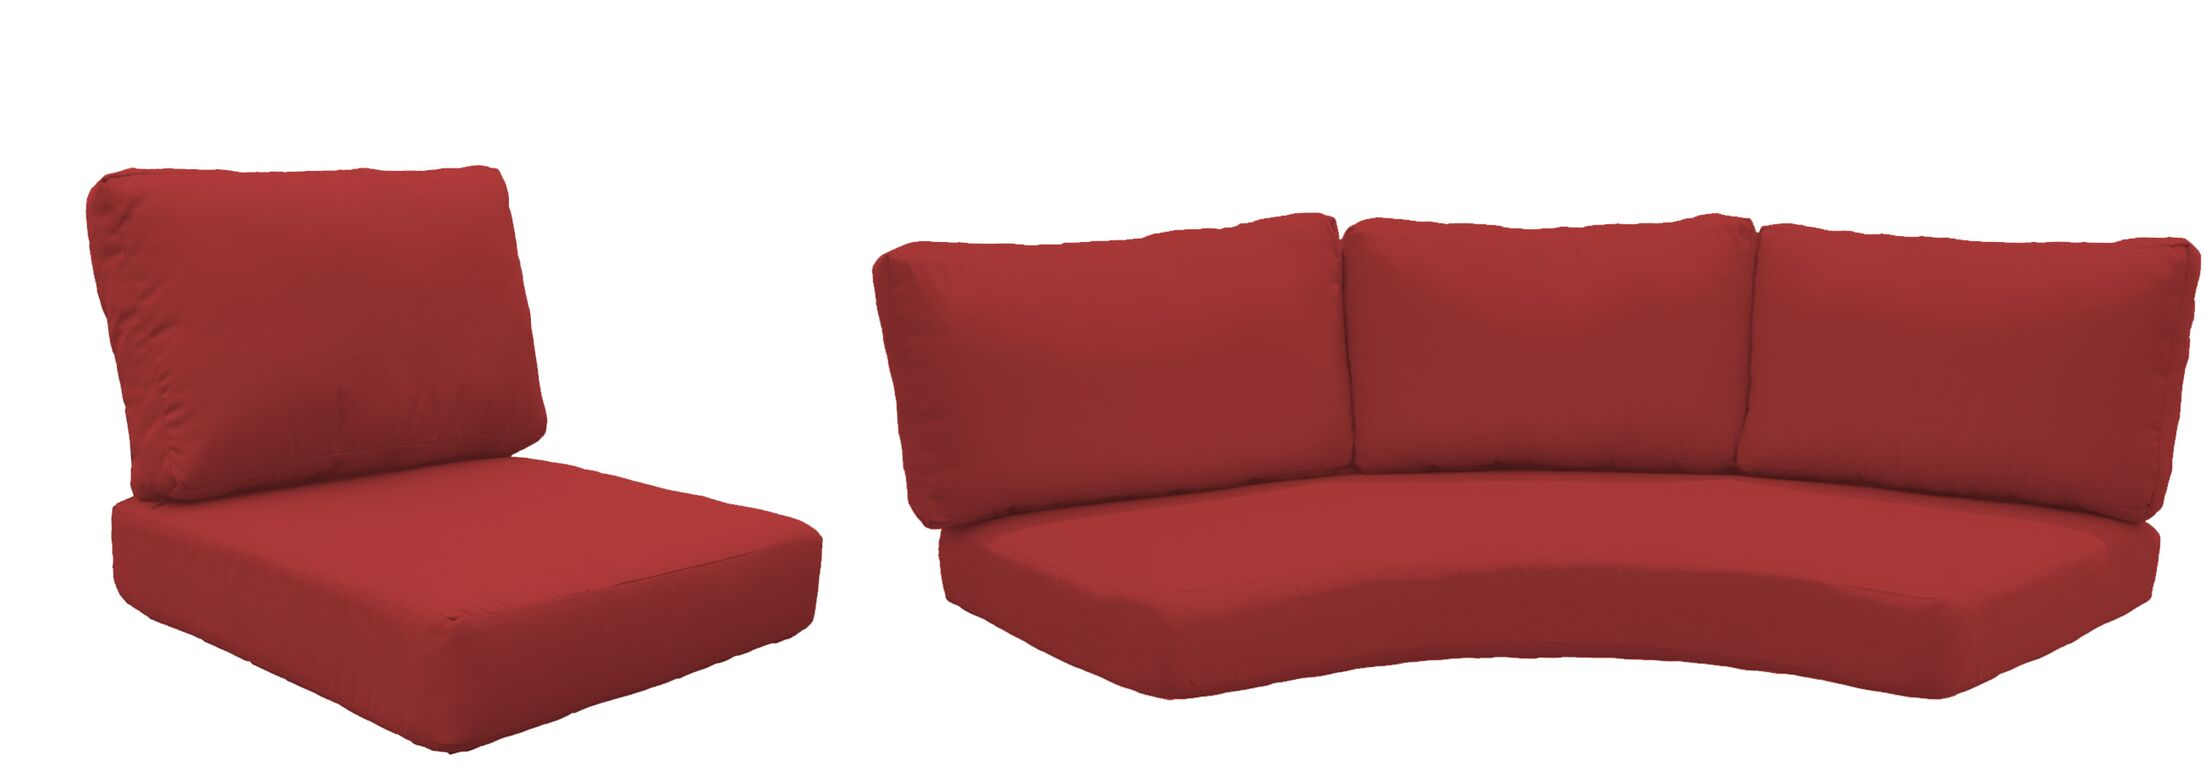 Barbados 10 Piece Outdoor Cushion Set Fabric: Terracotta